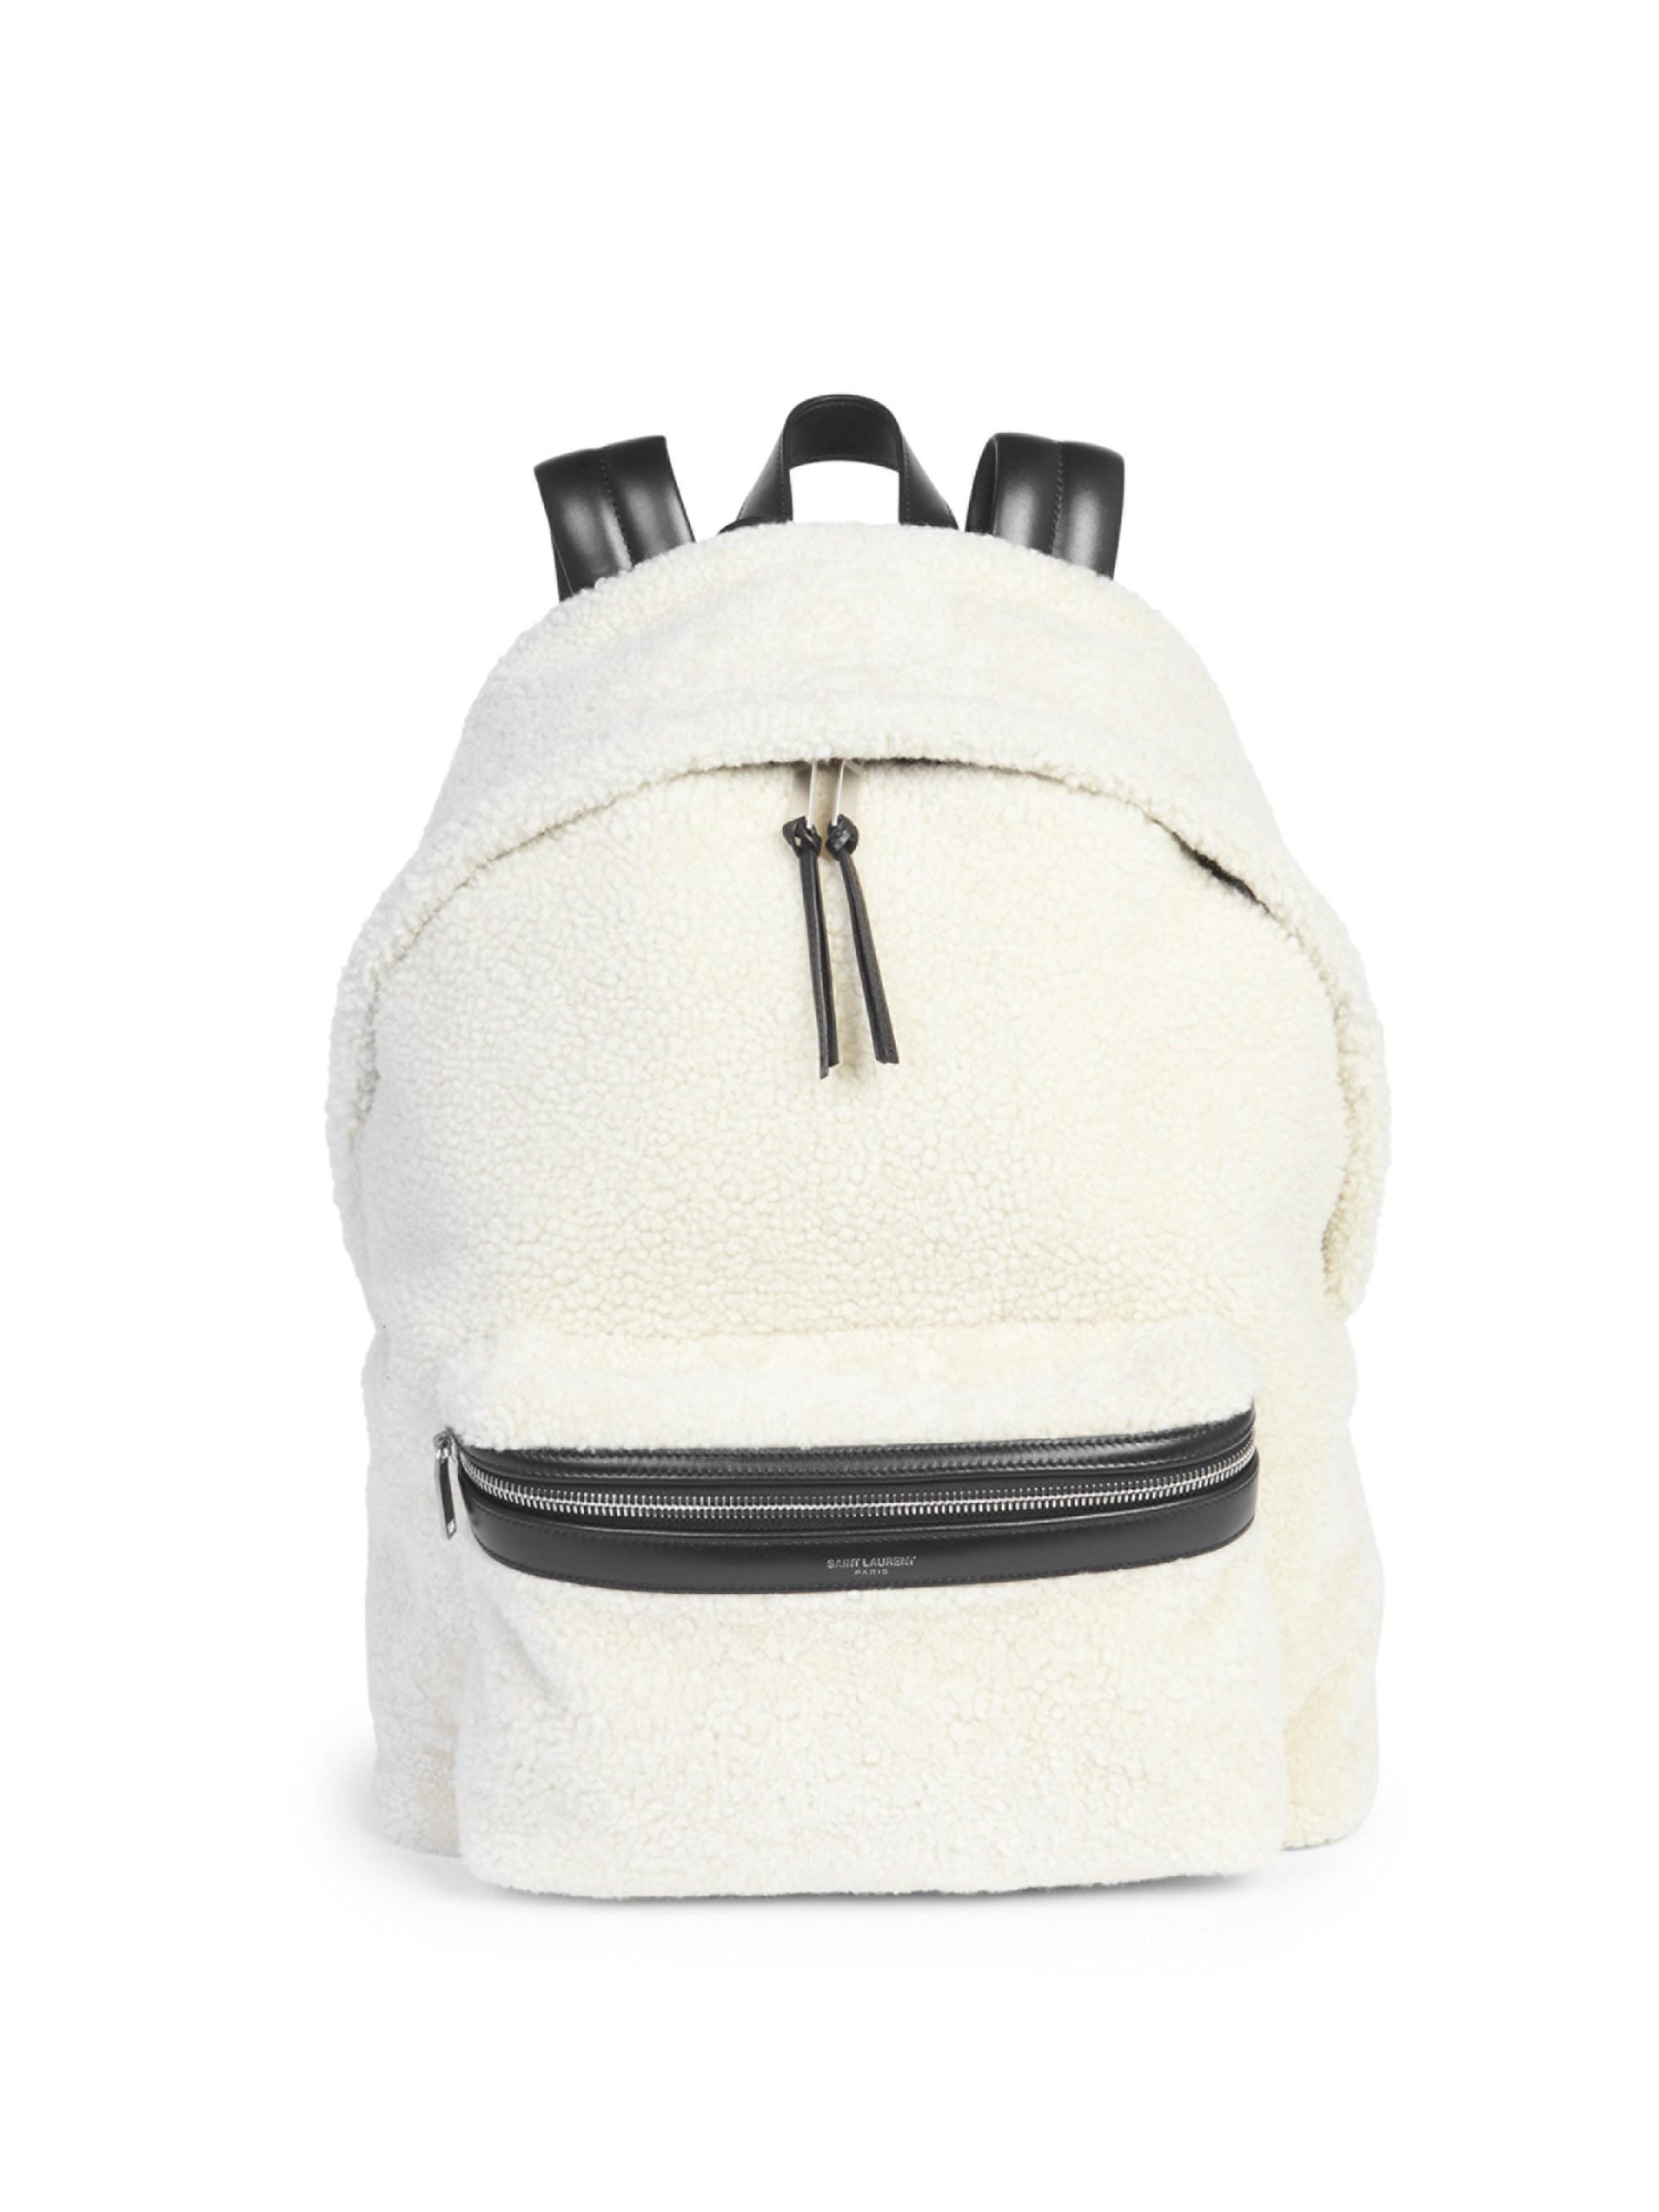 d26e3b28d47 Lyst - Saint Laurent Classic Zip City Backpack in Black for Men